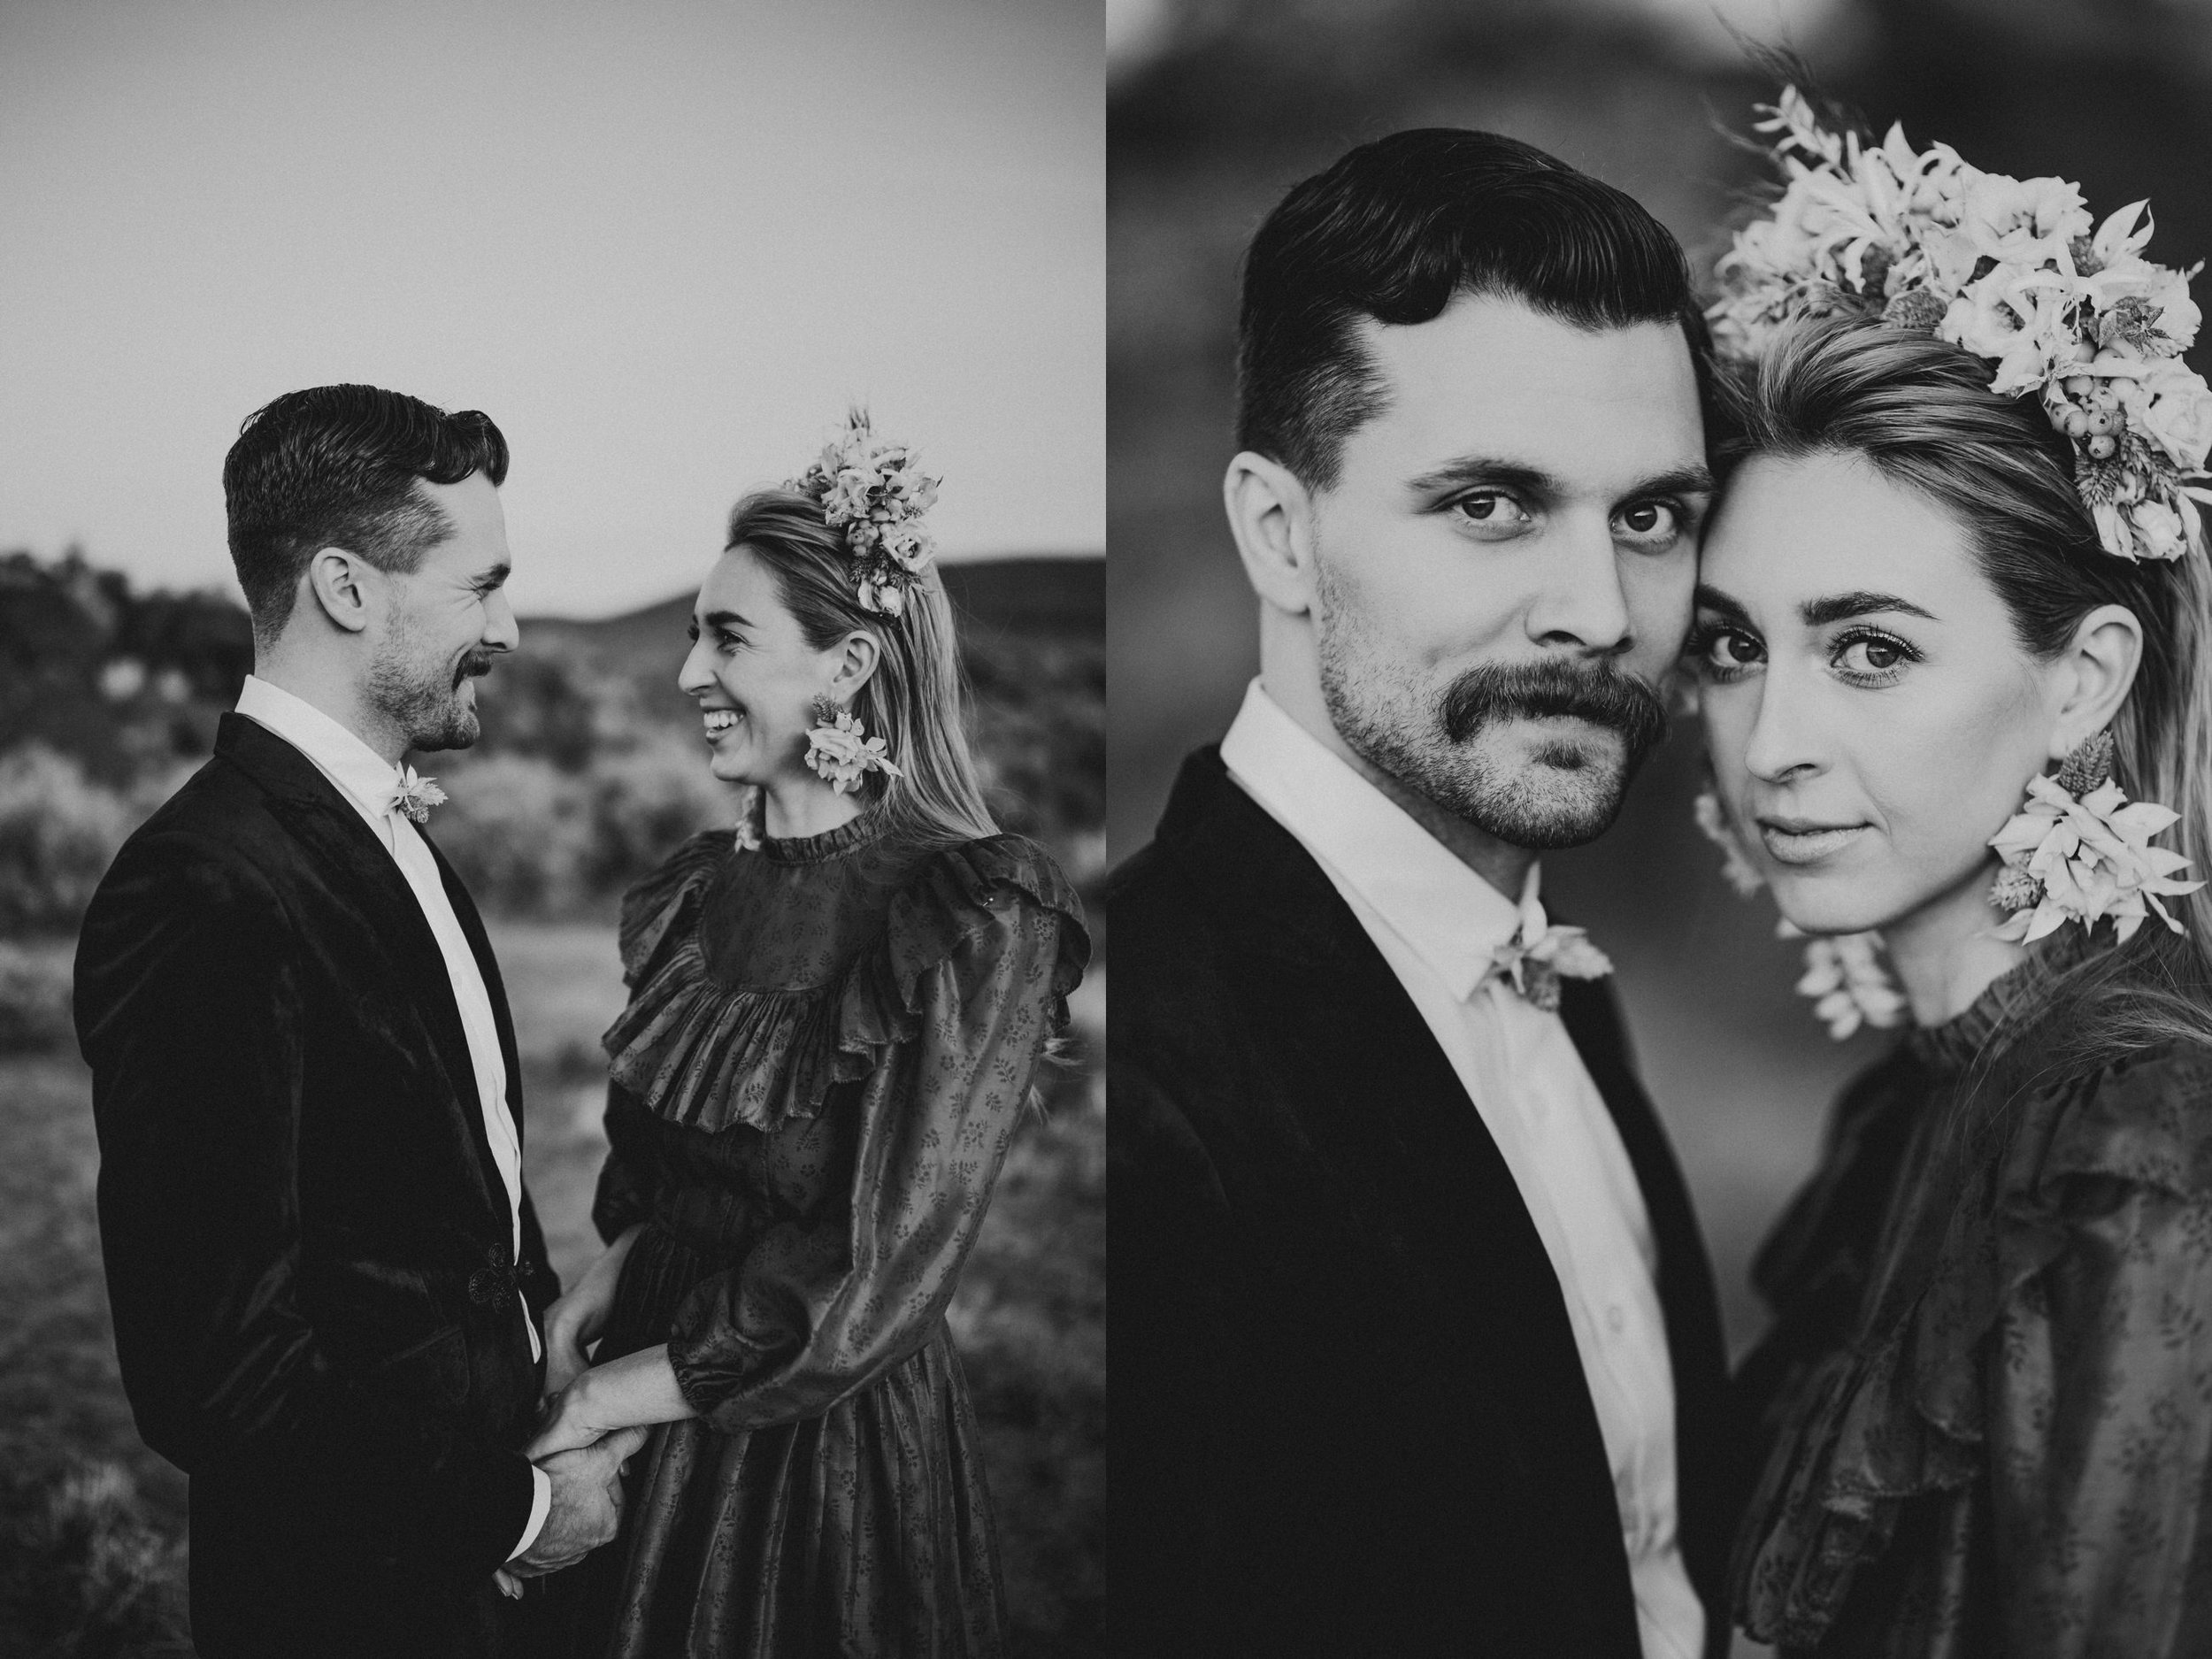 TONY-GAMBINO-PHOTOGRAPHY-BEND-OREGON-WEDDING-SHOOT_1495 Black And White.jpg